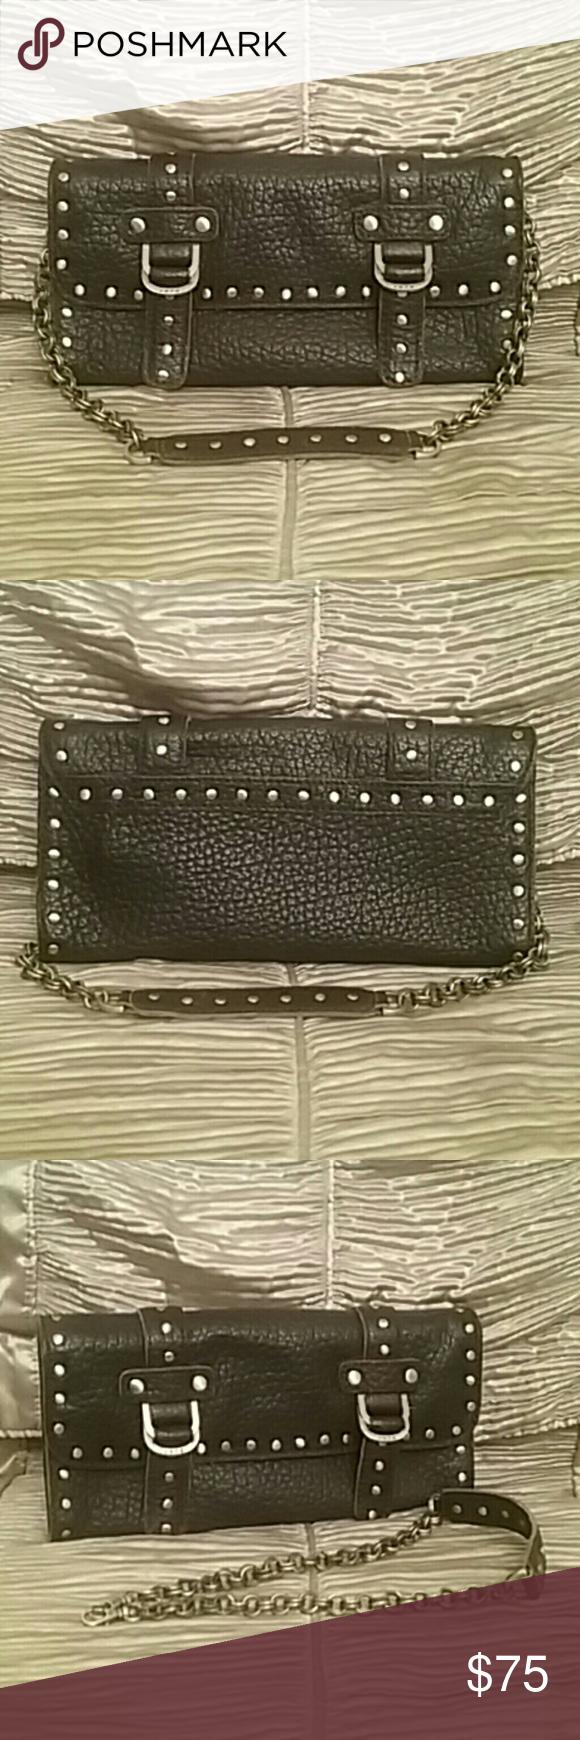 15b10b79b2 Rafe Purse Brown Leather - Detachable Strap Authentic Rafe New York Purse  Brown Leather Shoulder Bag. Detachable strap